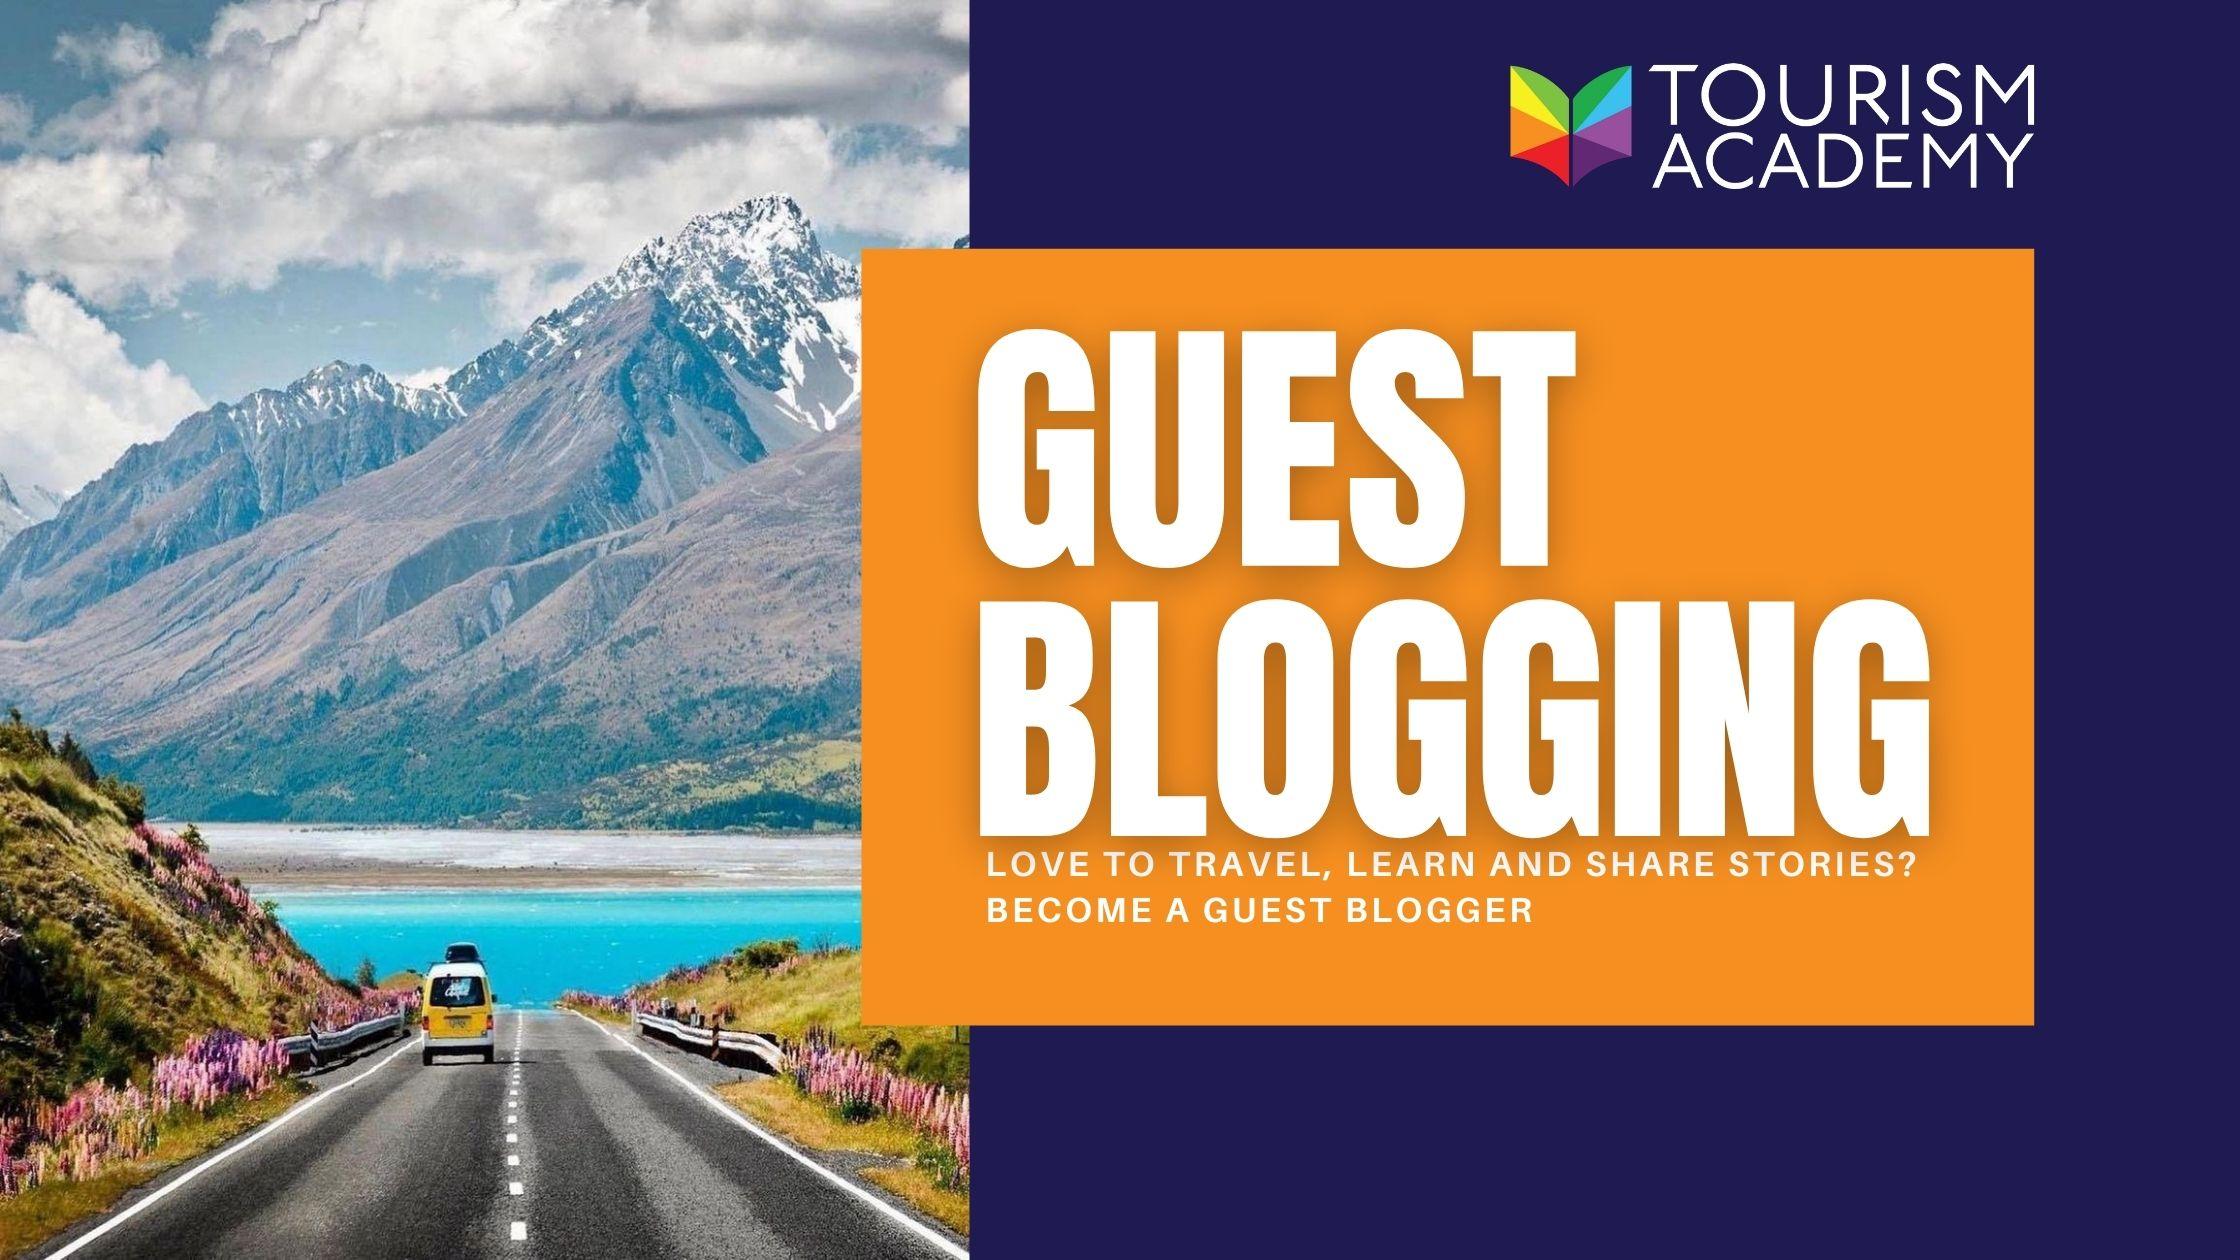 travel blog guest blogger writer tourism